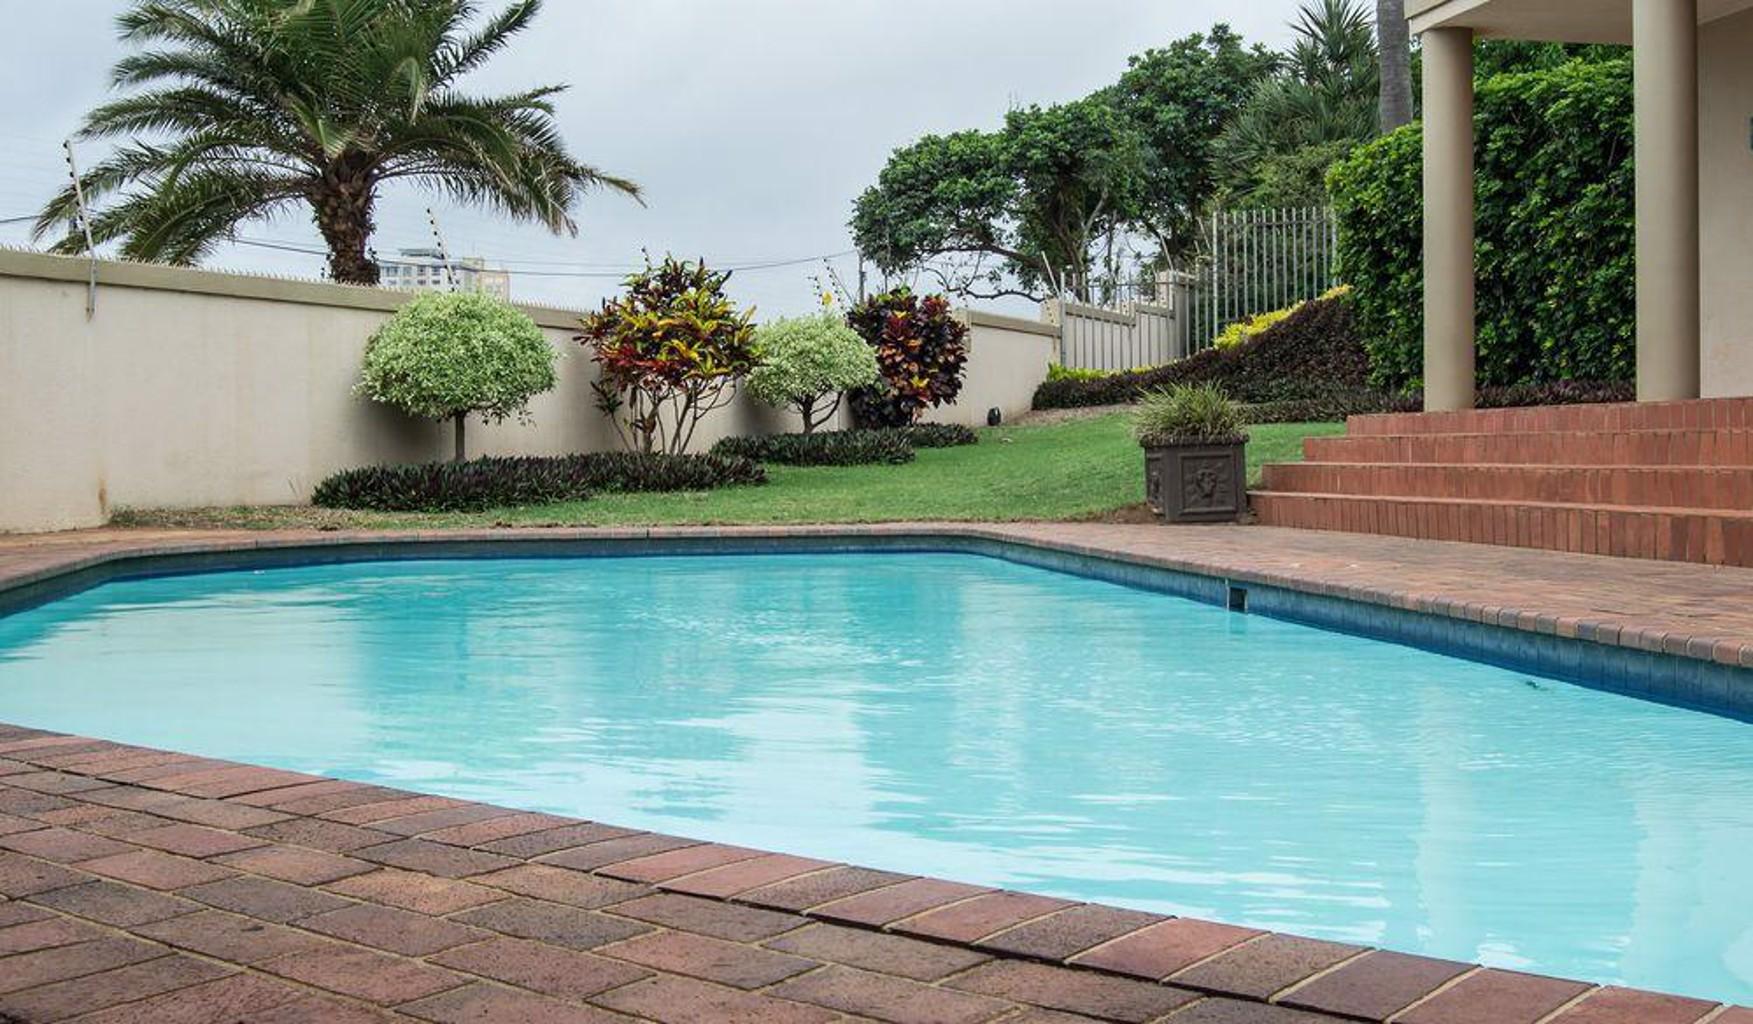 The Shades Luxury Garden Apartment